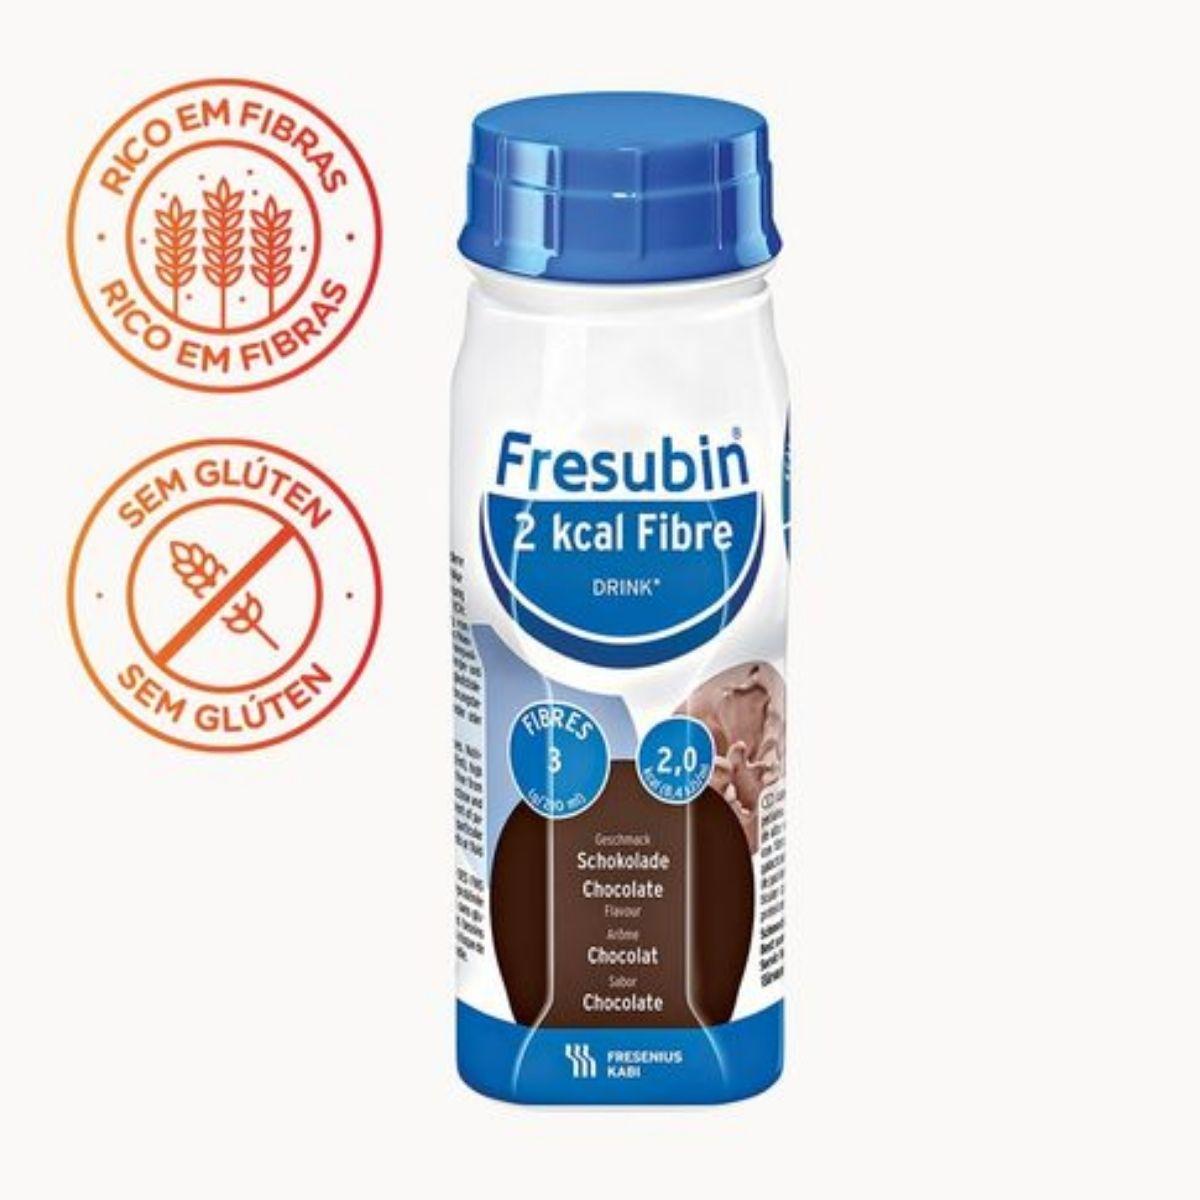 FRESUBIN 2 KCAL FIBRE DRINK CHOCOLATE  200ML